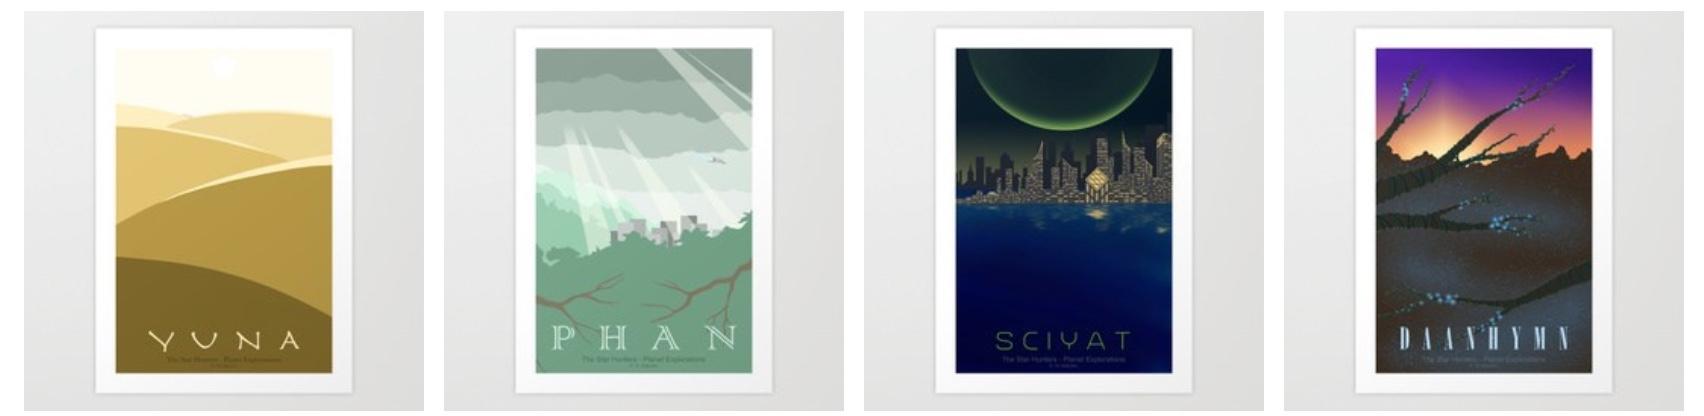 Planets.jpeg